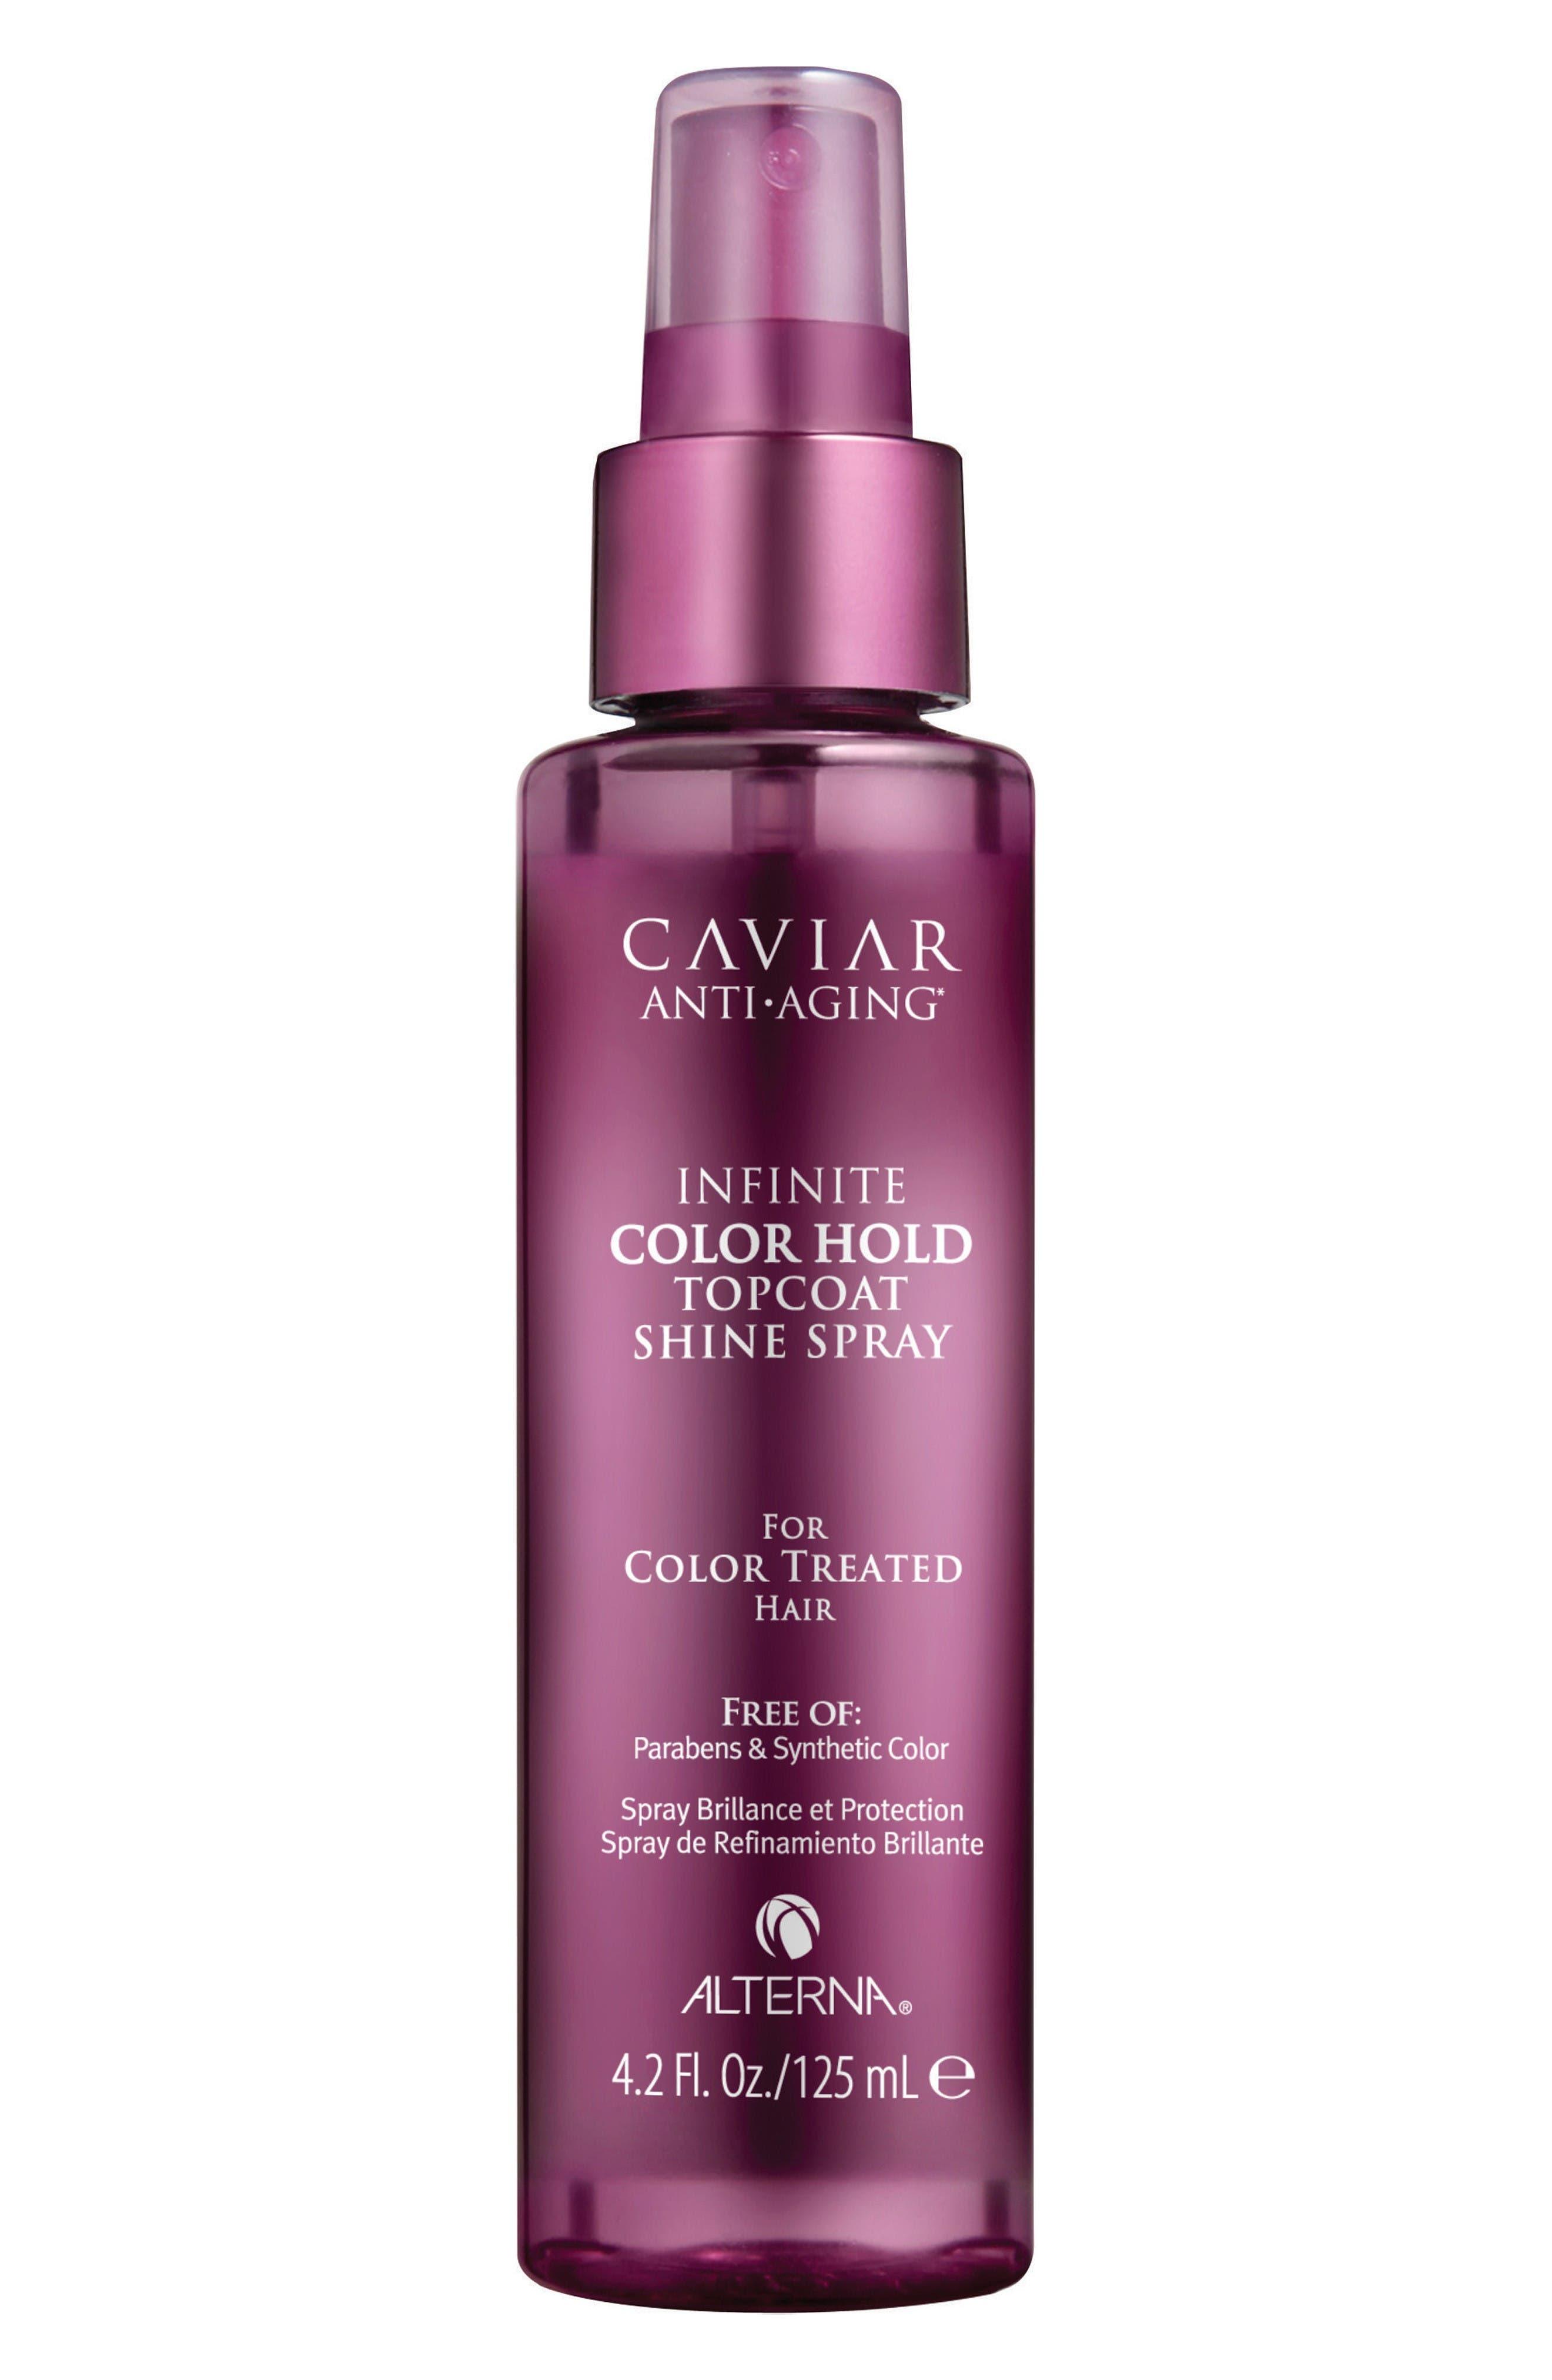 Alternate Image 1 Selected - ALTERNA® Caviar Infinite Color Hold Topcoat Shine Spray